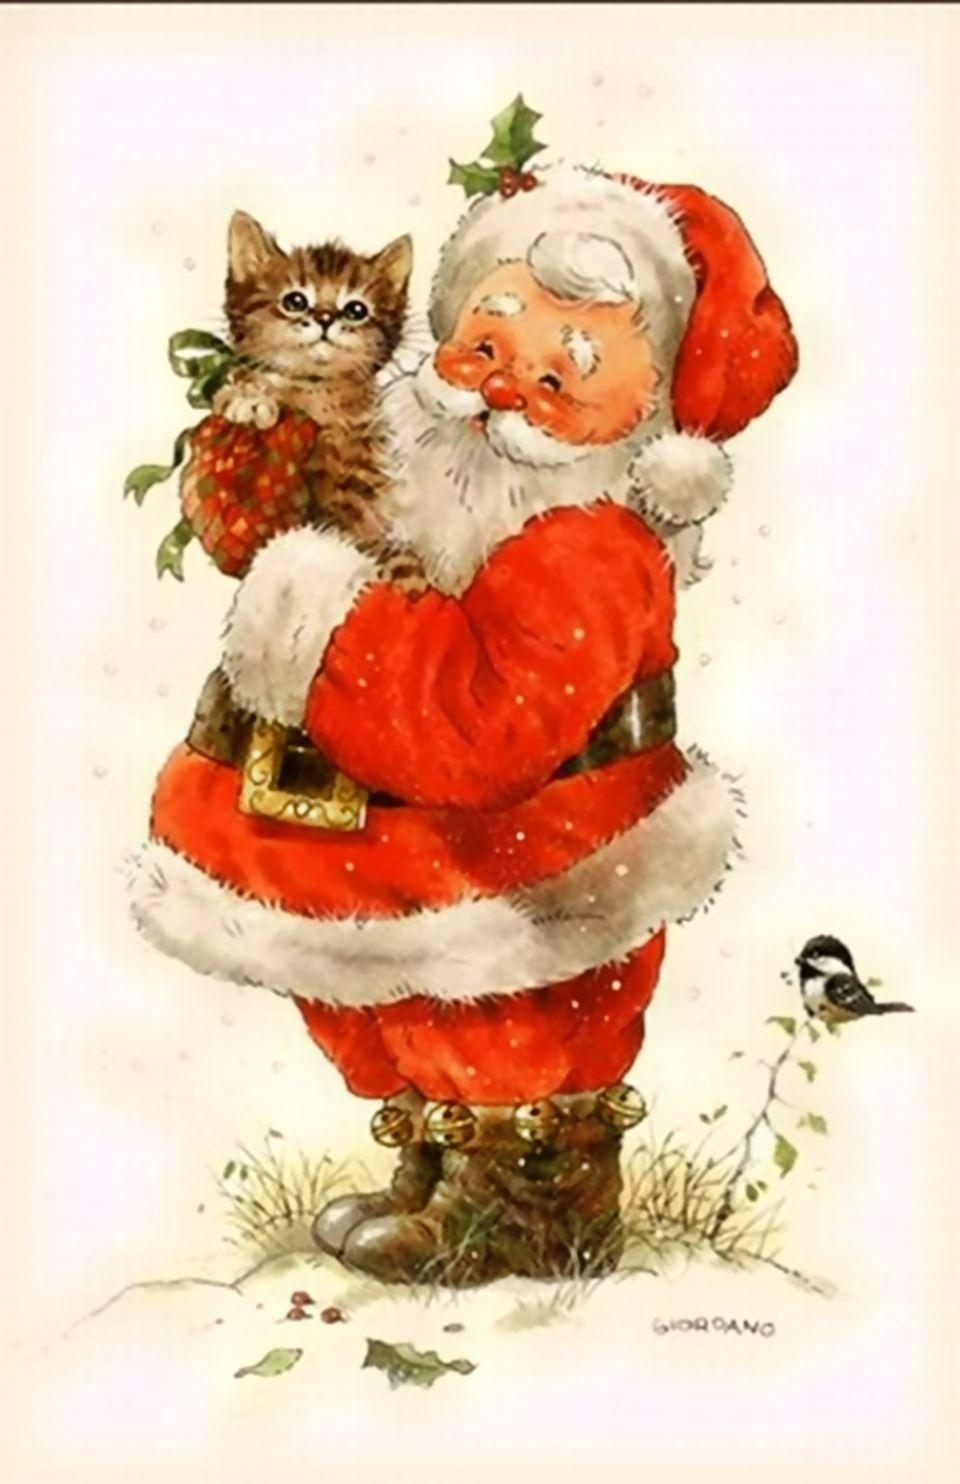 weihnachtsmann vintage santa claus pinterest noel p res no l vintage and papa noel